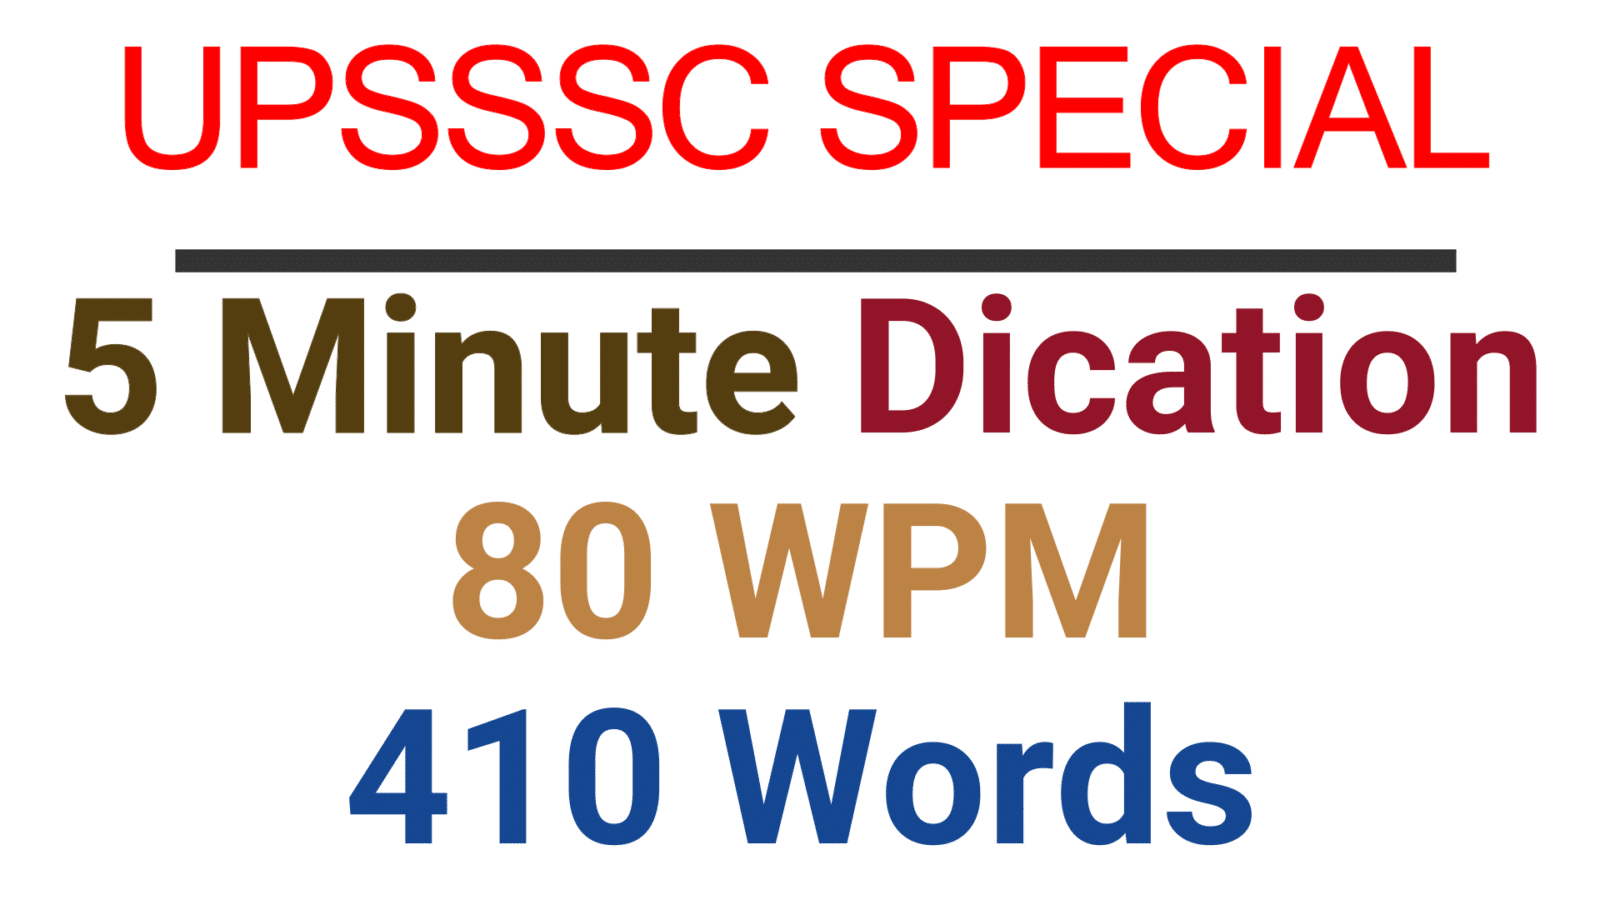 Hindi Shorthand Dictation 80 WPM 400 words